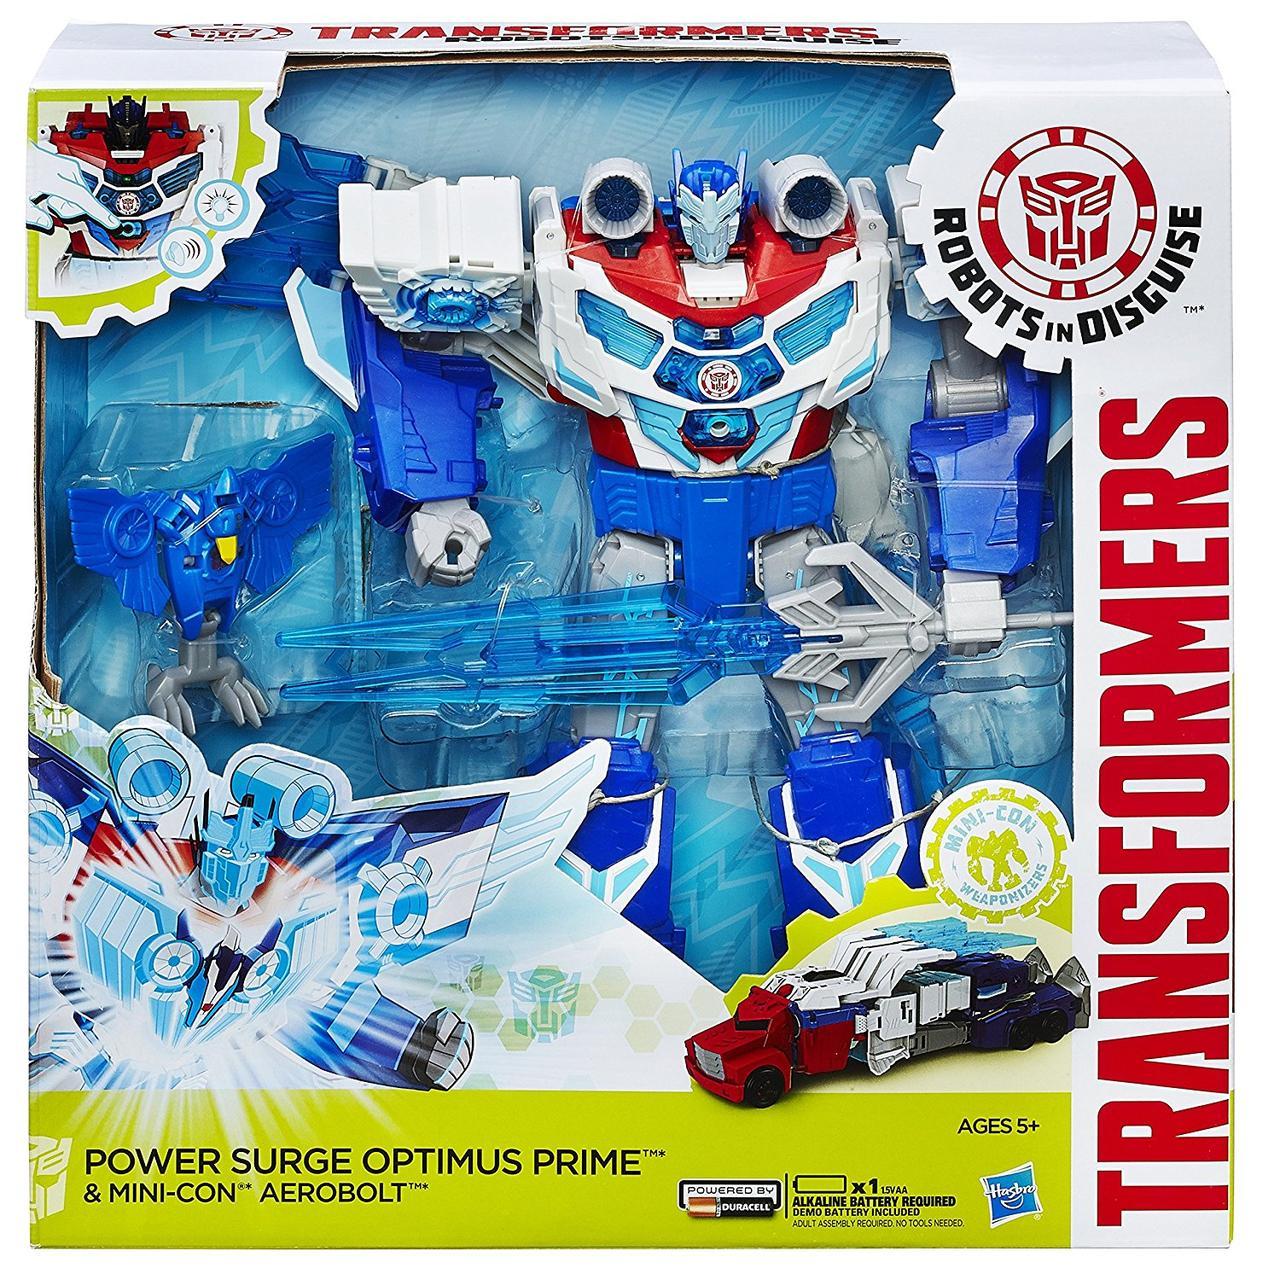 Transformers Optimus Prime  Заряжений Оптимус Прайм  (32 см Hasbro B7066 Роботы под прикрытием)